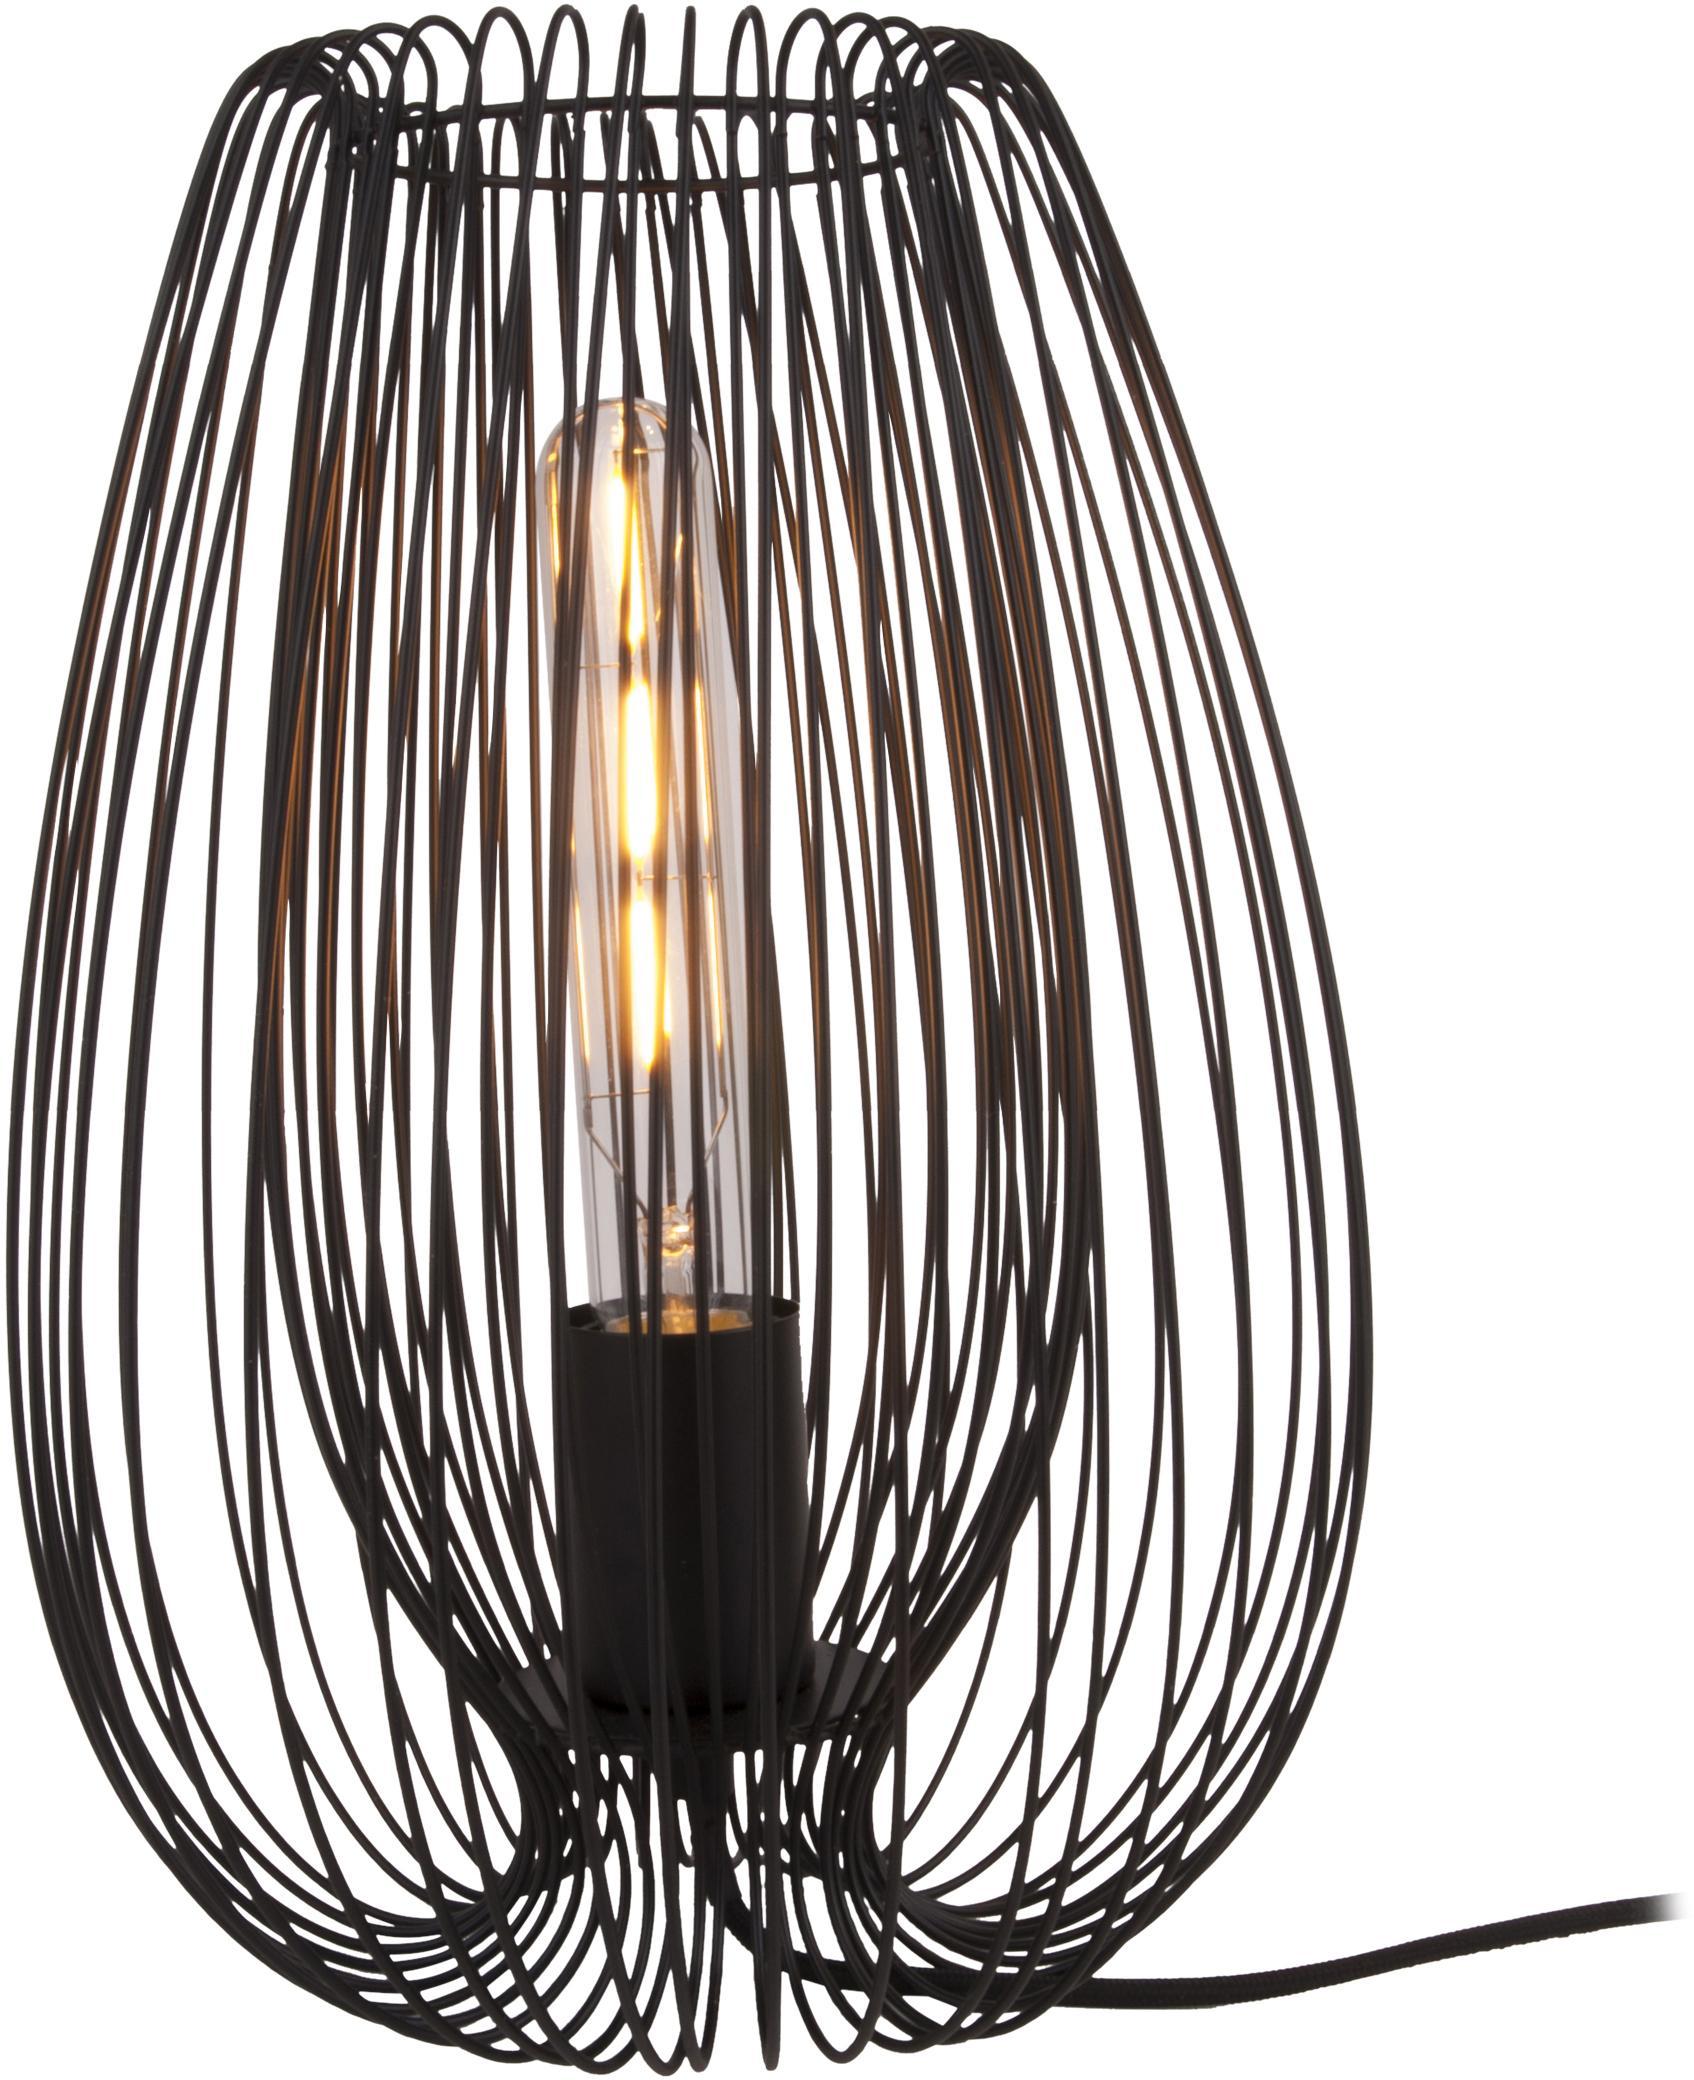 Retro tafellamp Lucid, Lamp: gelakt metaal, Zwart, Ø 22 x H 33 cm